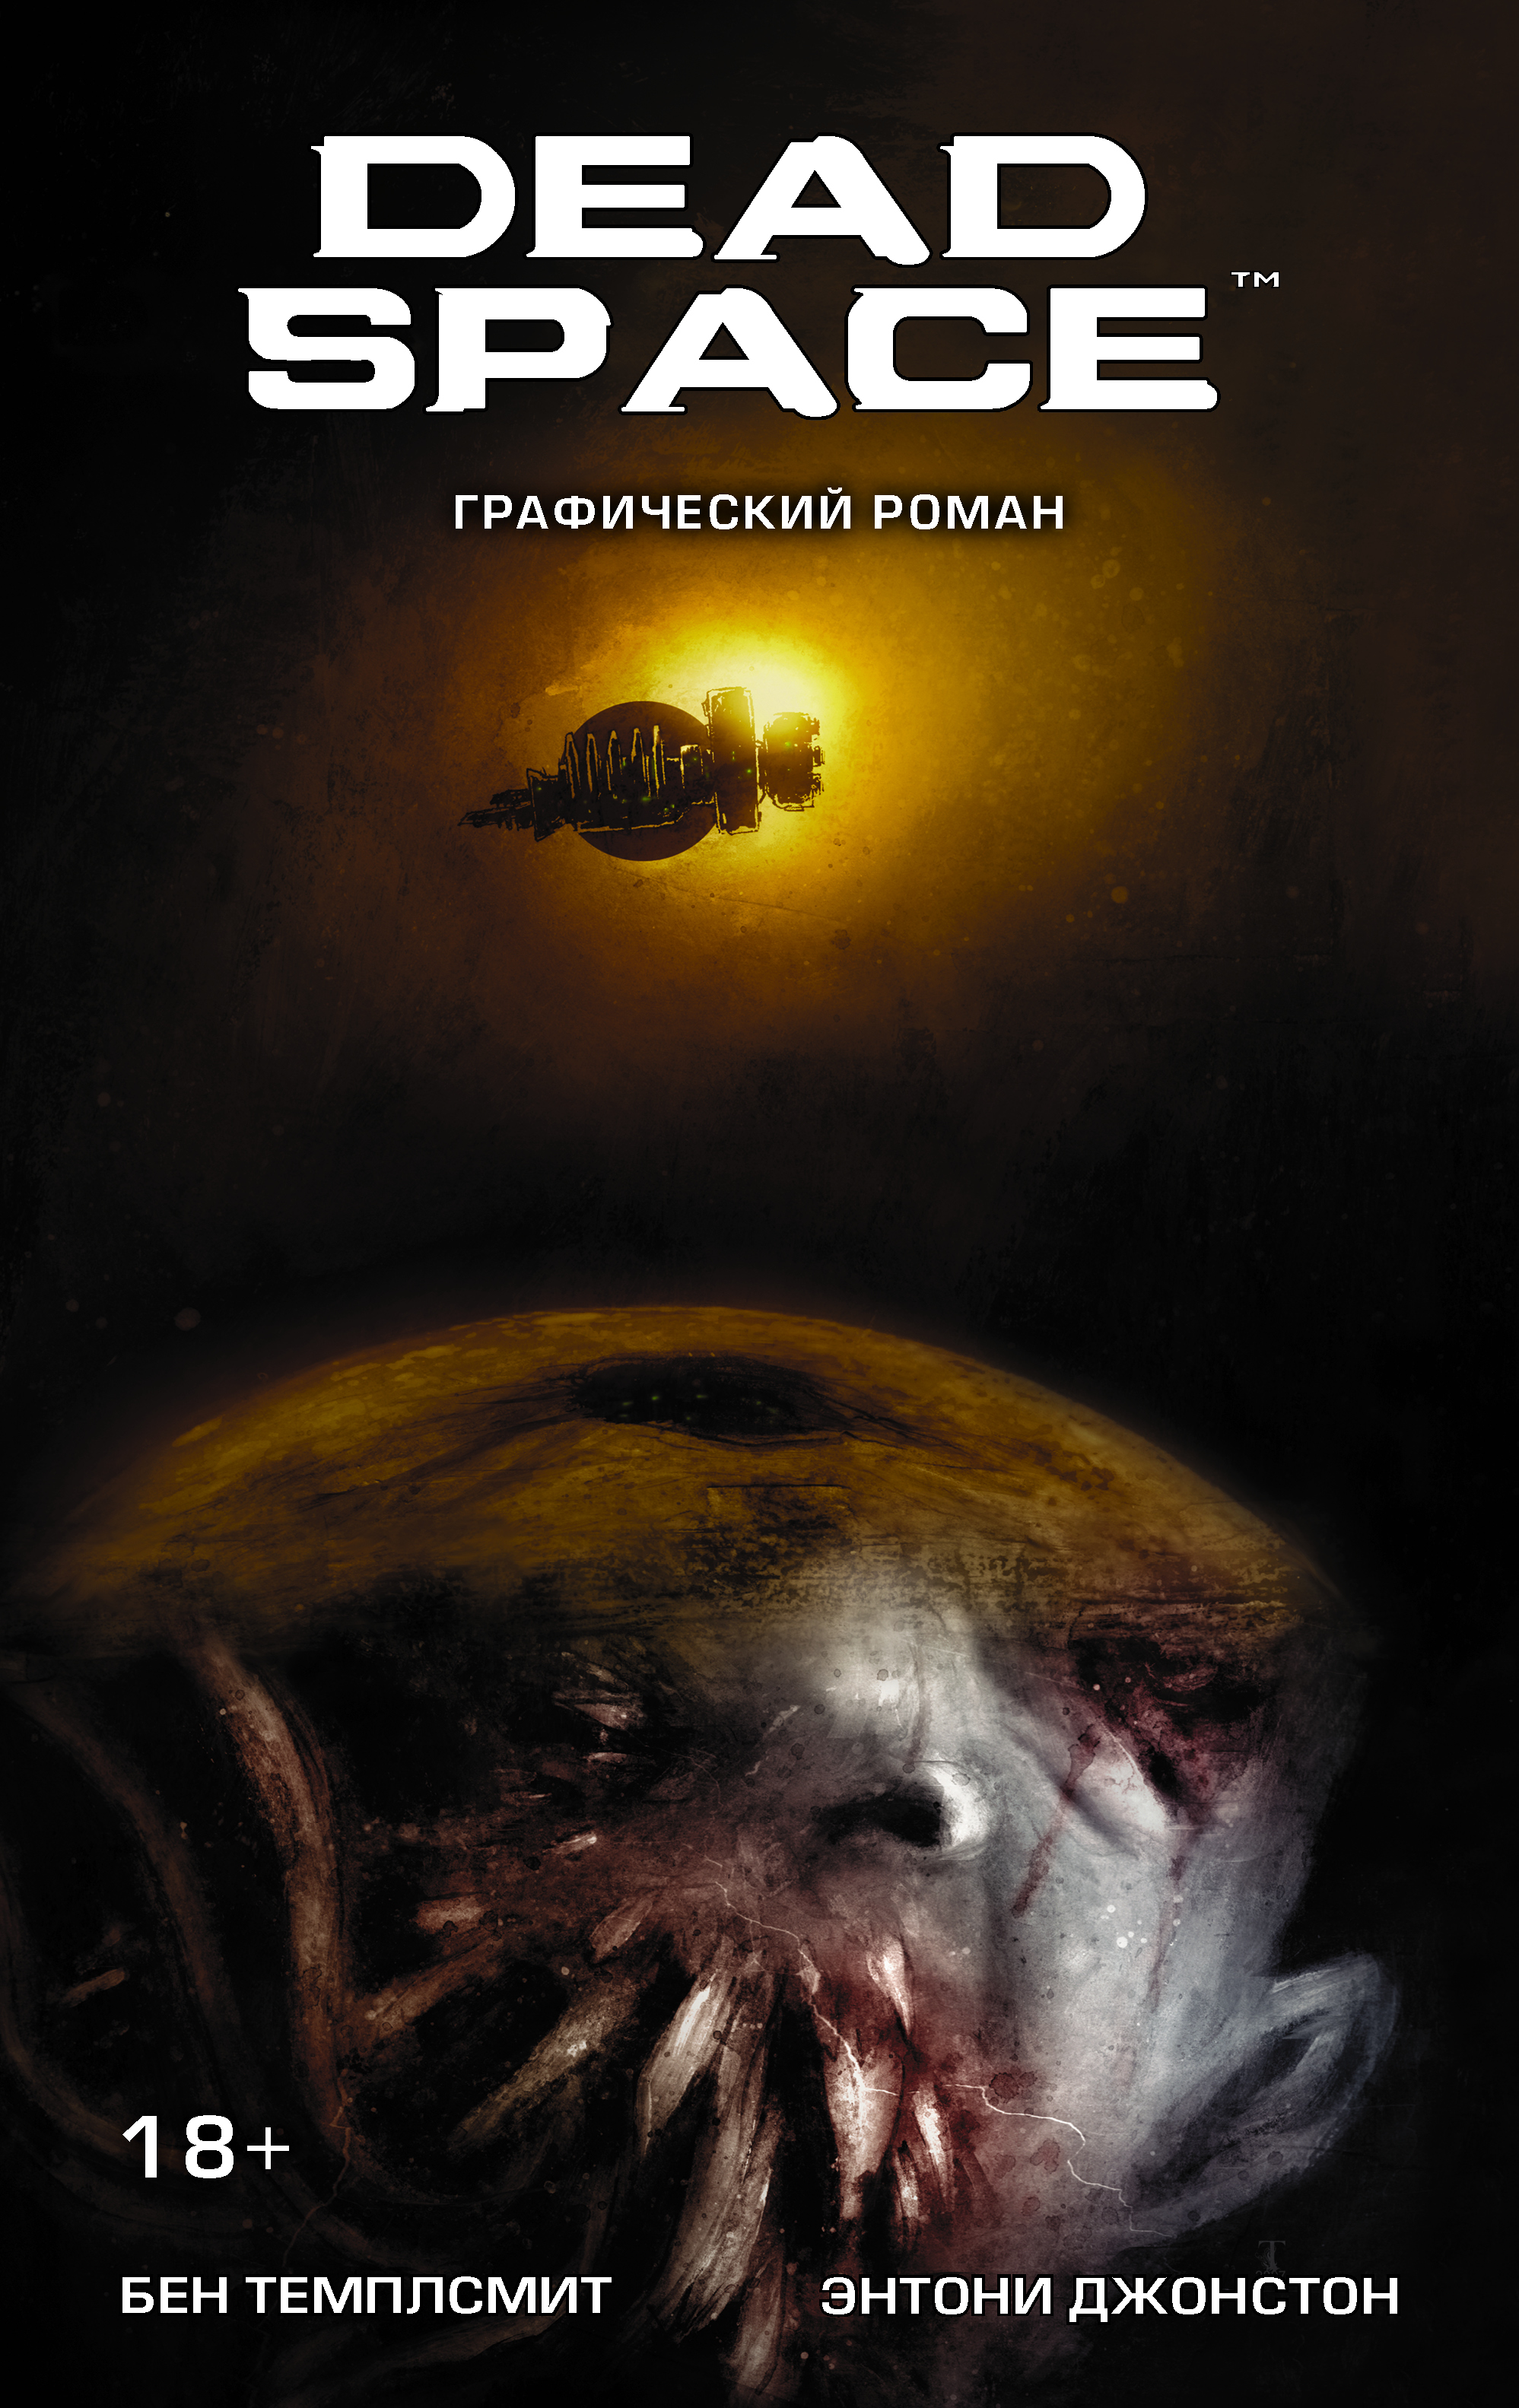 Dead Space ( Темплсмит Б., Энтони Д.  )